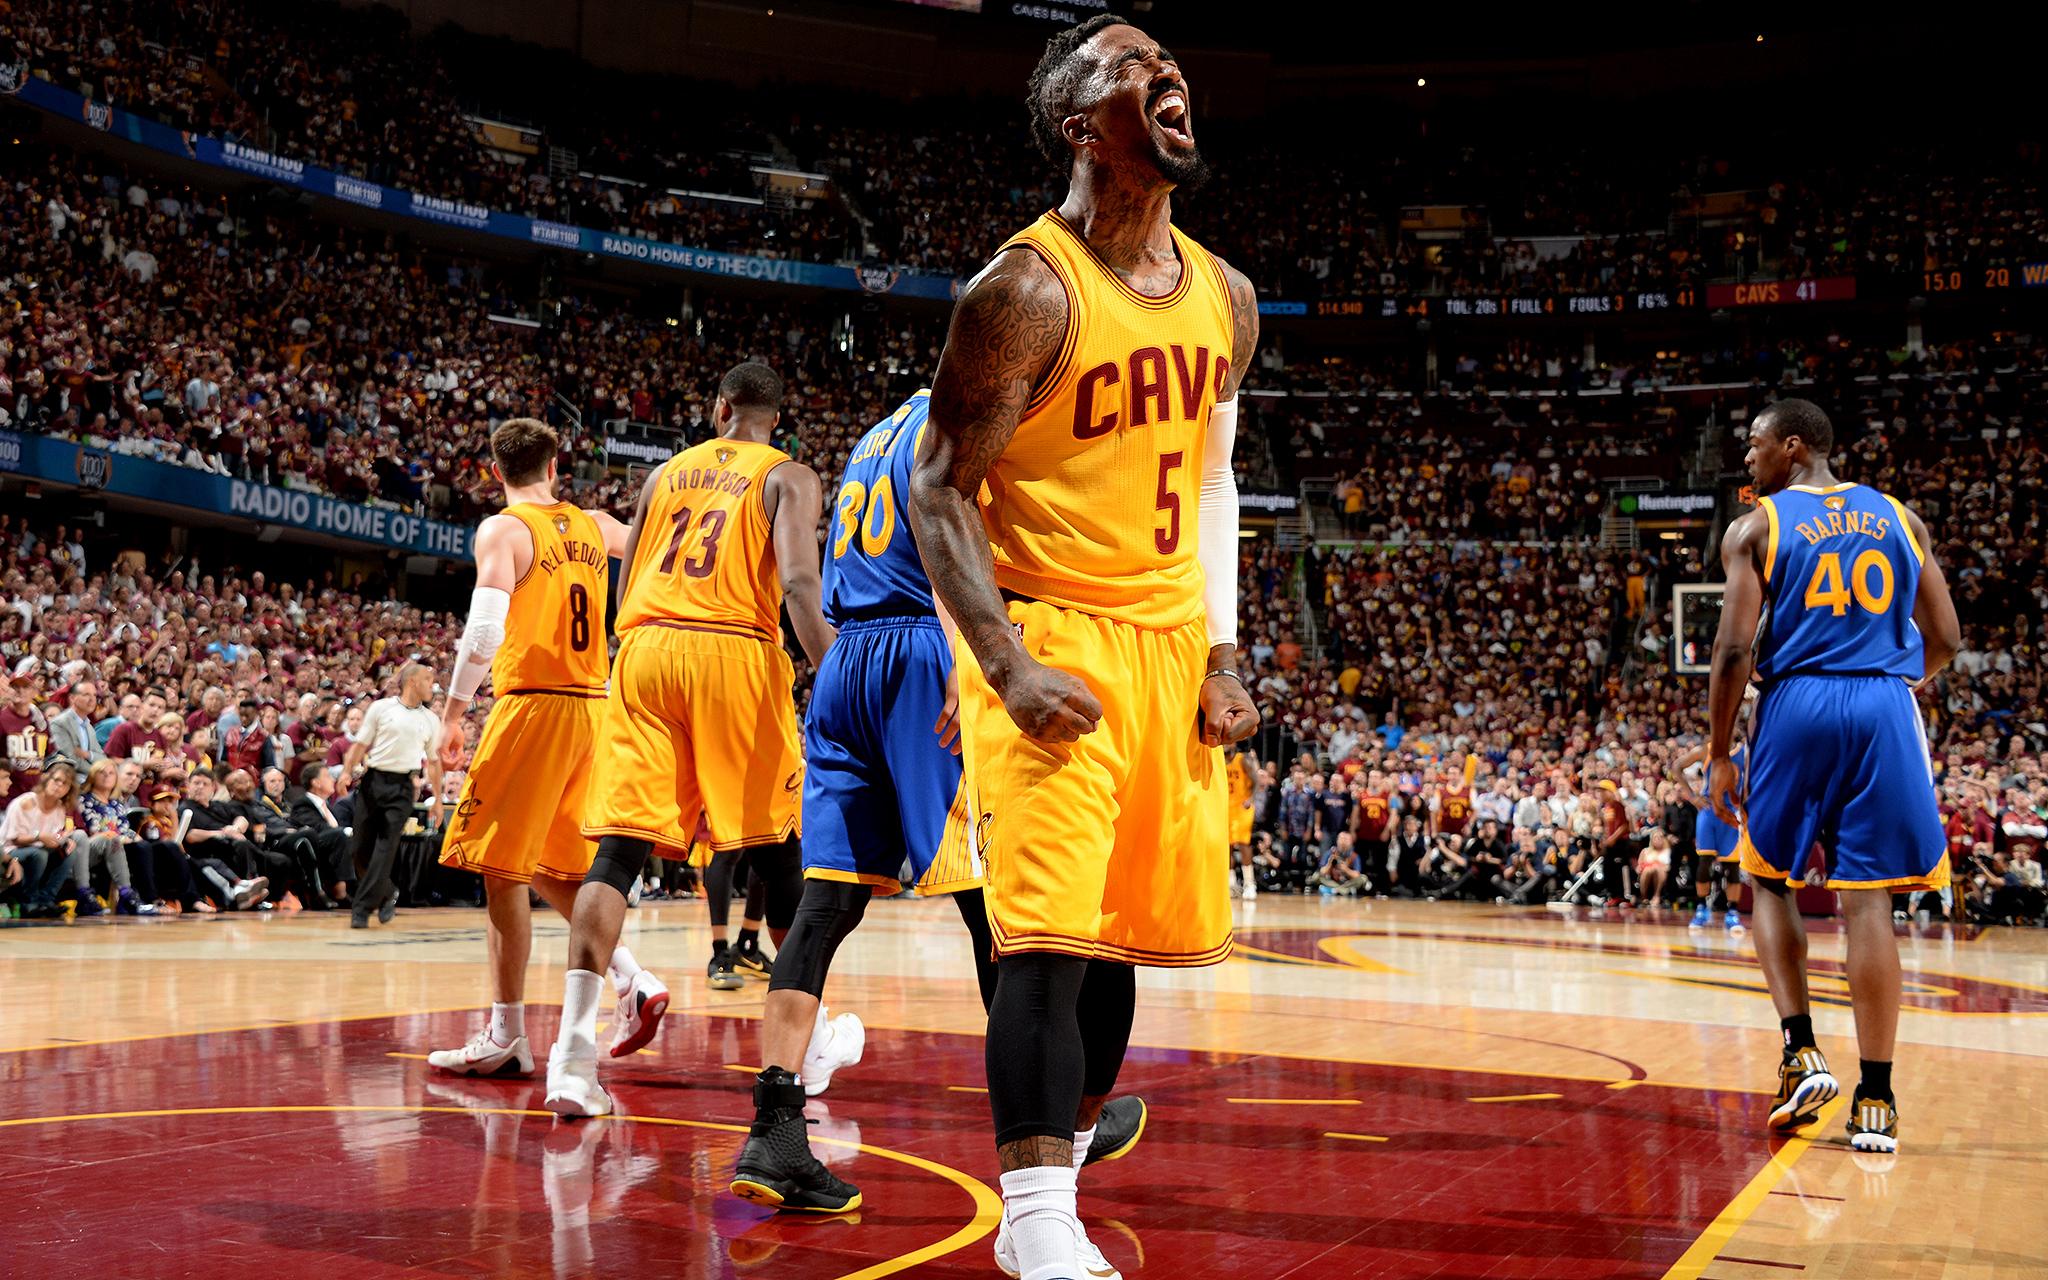 Feelin' it - The NBA Finals - Game 3 - ESPN